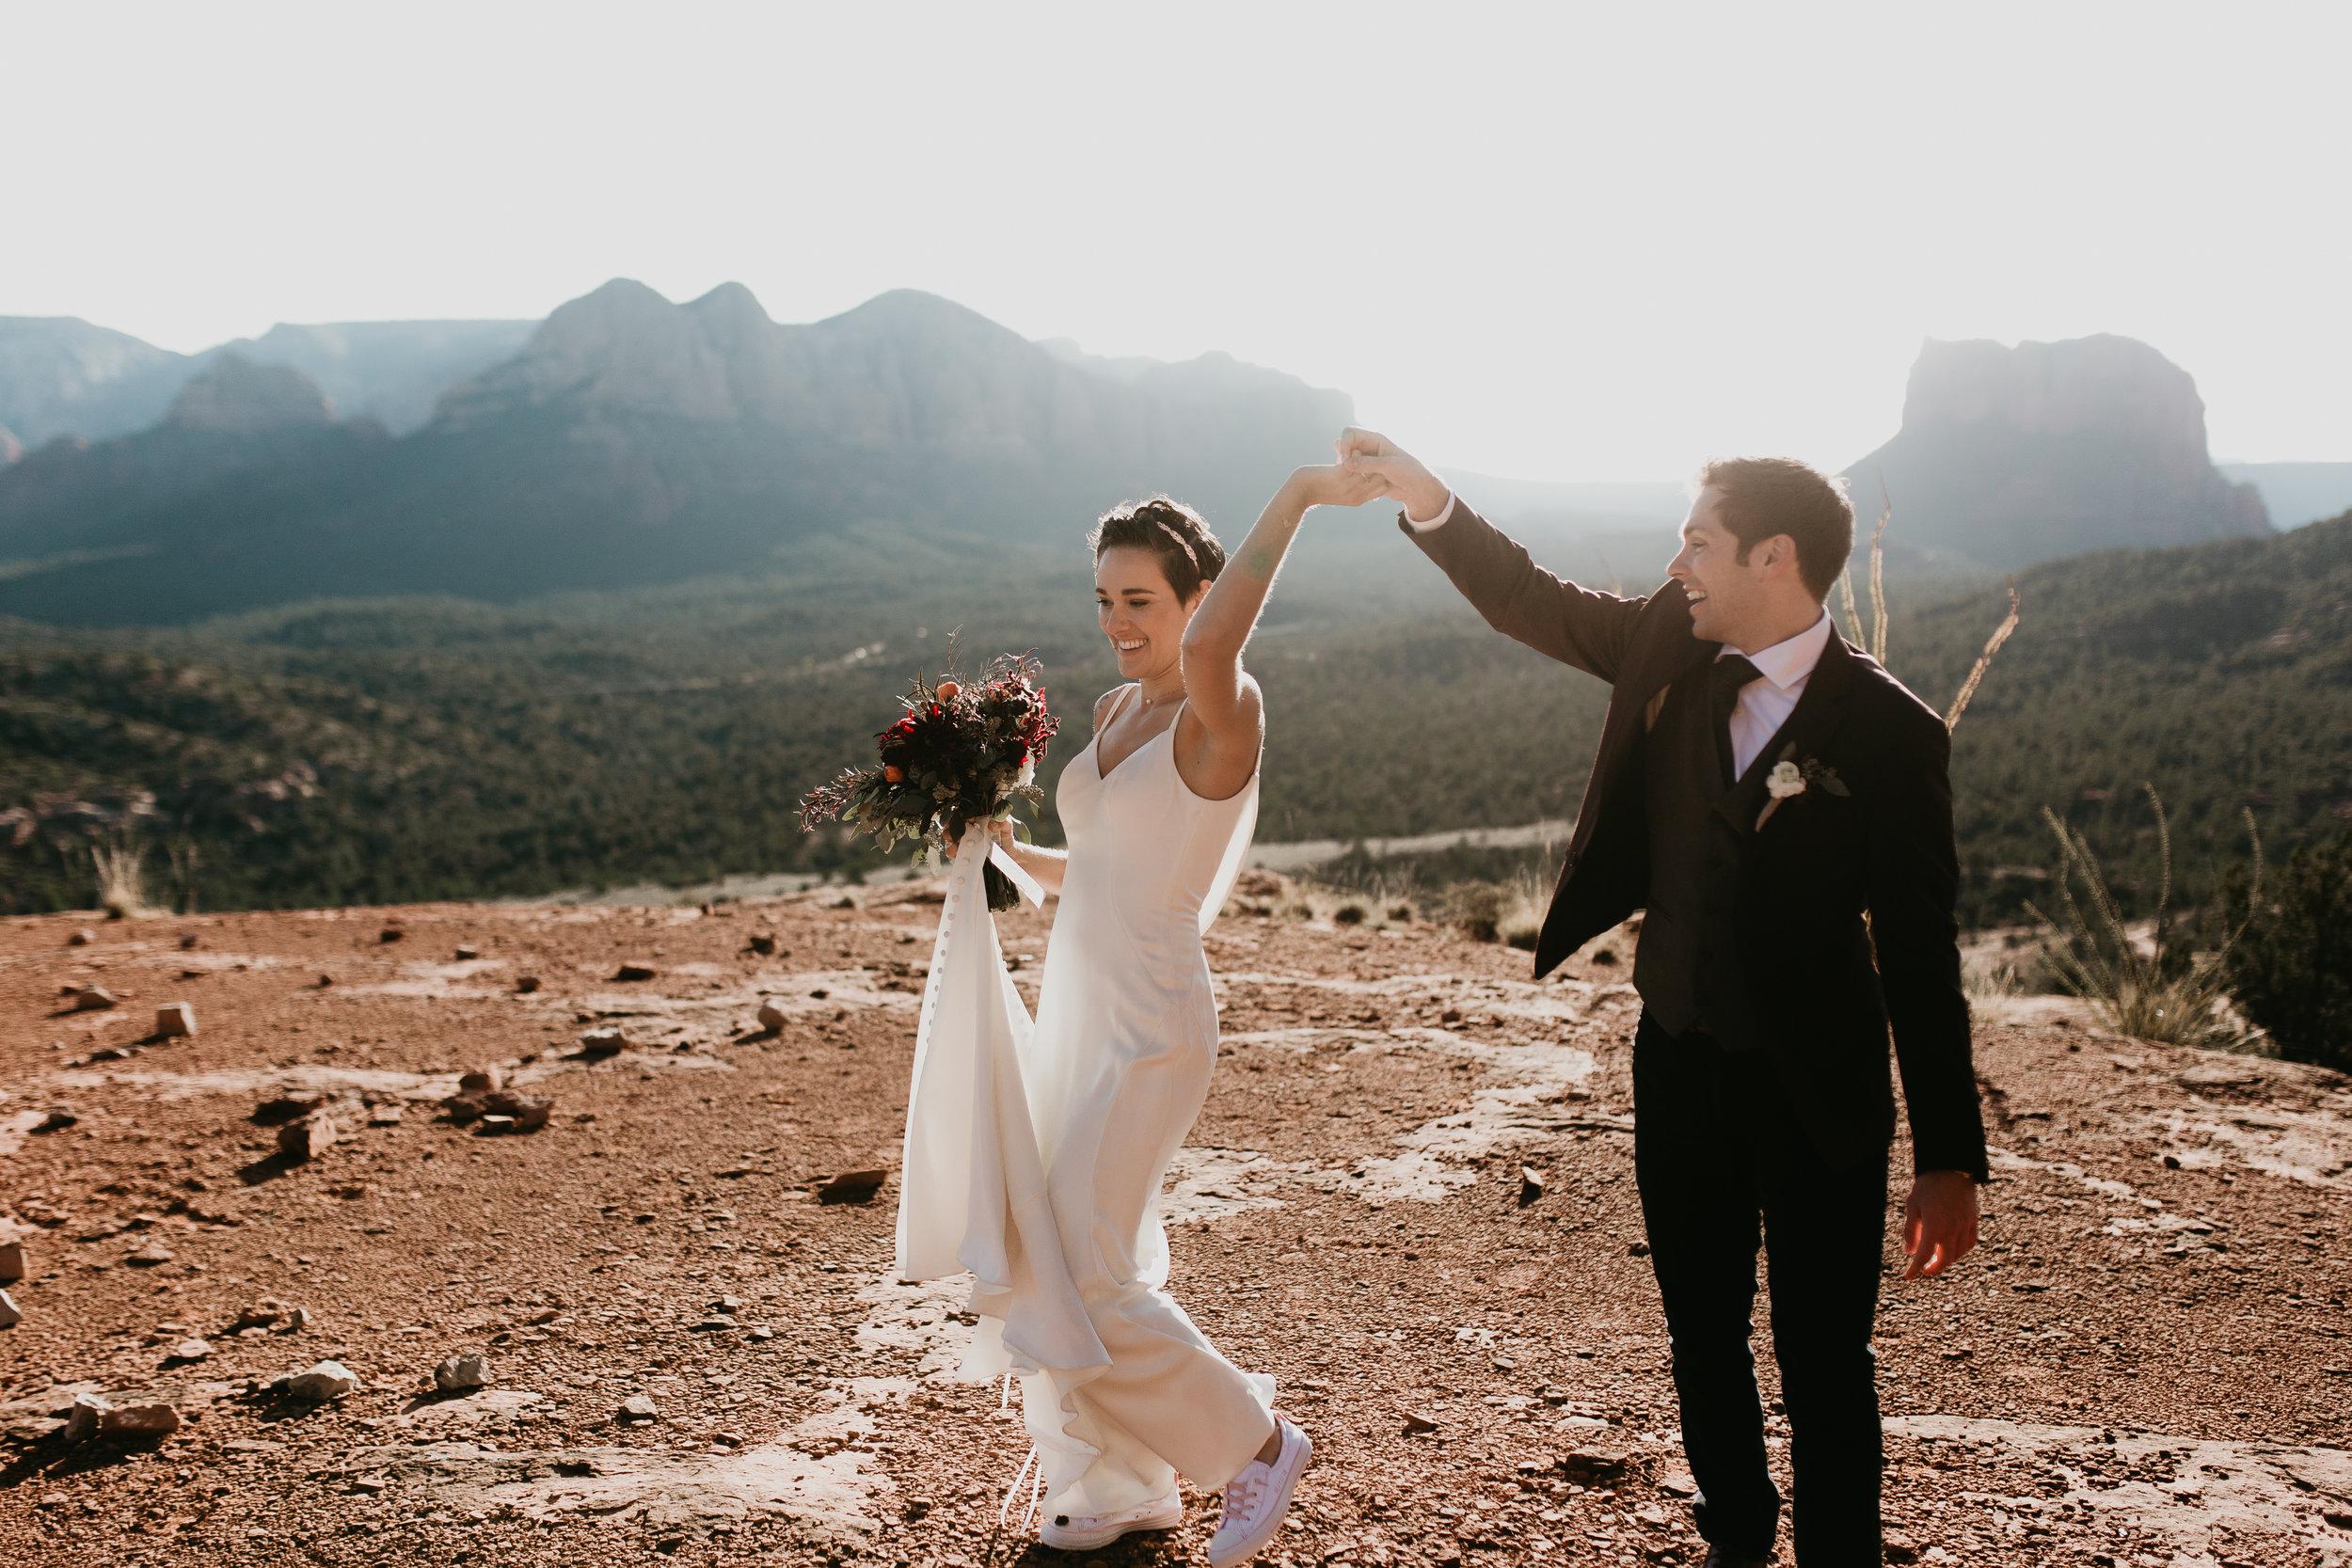 nicole-daacke-photography-sedona-arizona-destination-elopement-wedding-photographer-catherdral-rock-hiking-elopement-sedona-river-elopement-photos-desert-rock-wedding-photographer-laid-back-spontaneous-elopement-67.jpg